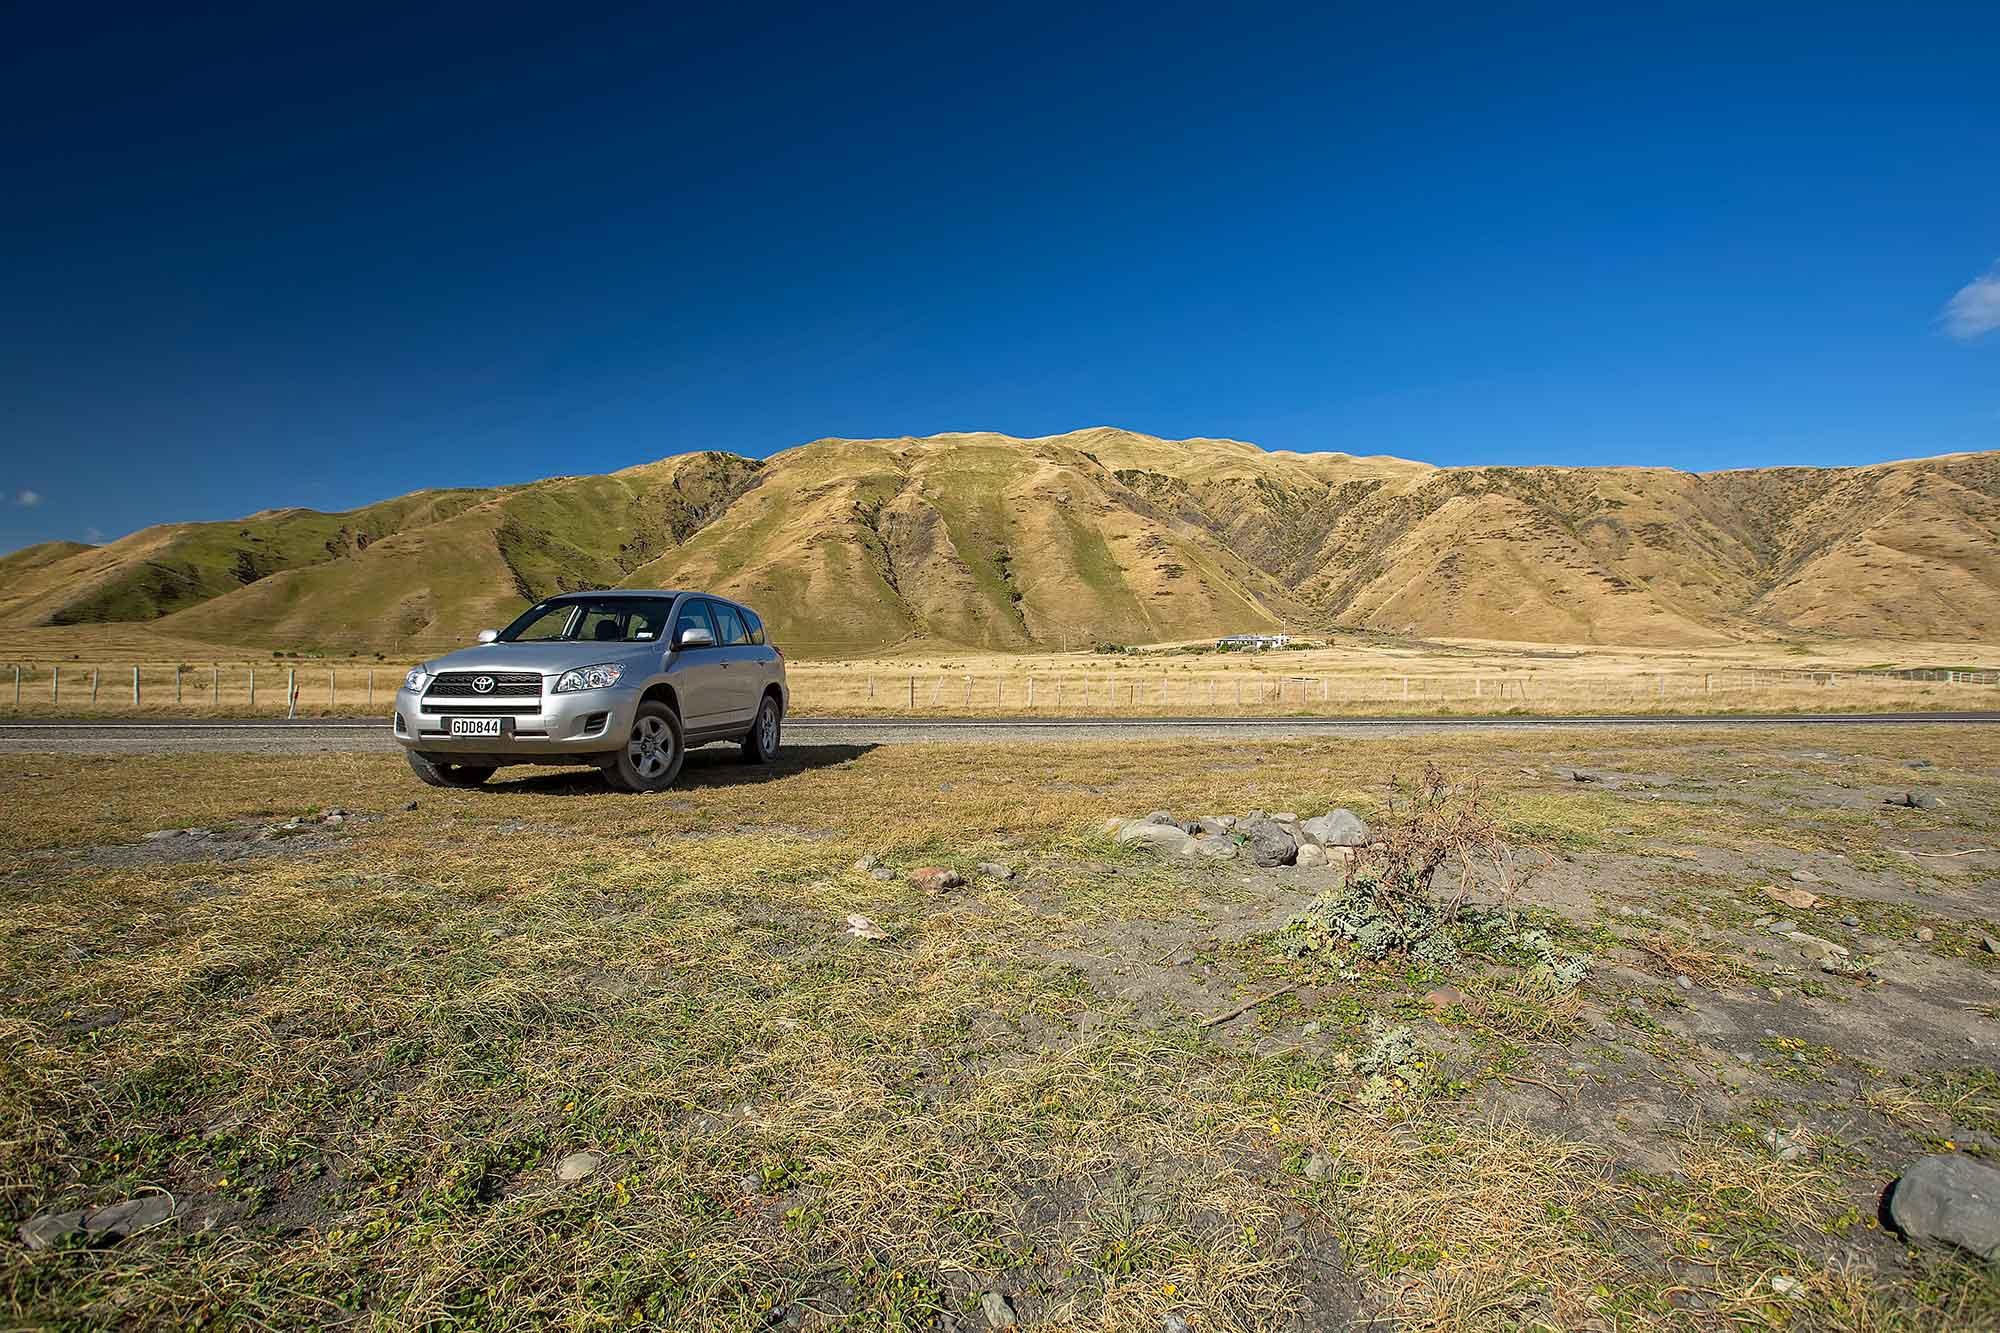 On a road trip through New Zealand. © Ulli Maier & Nisa Maier